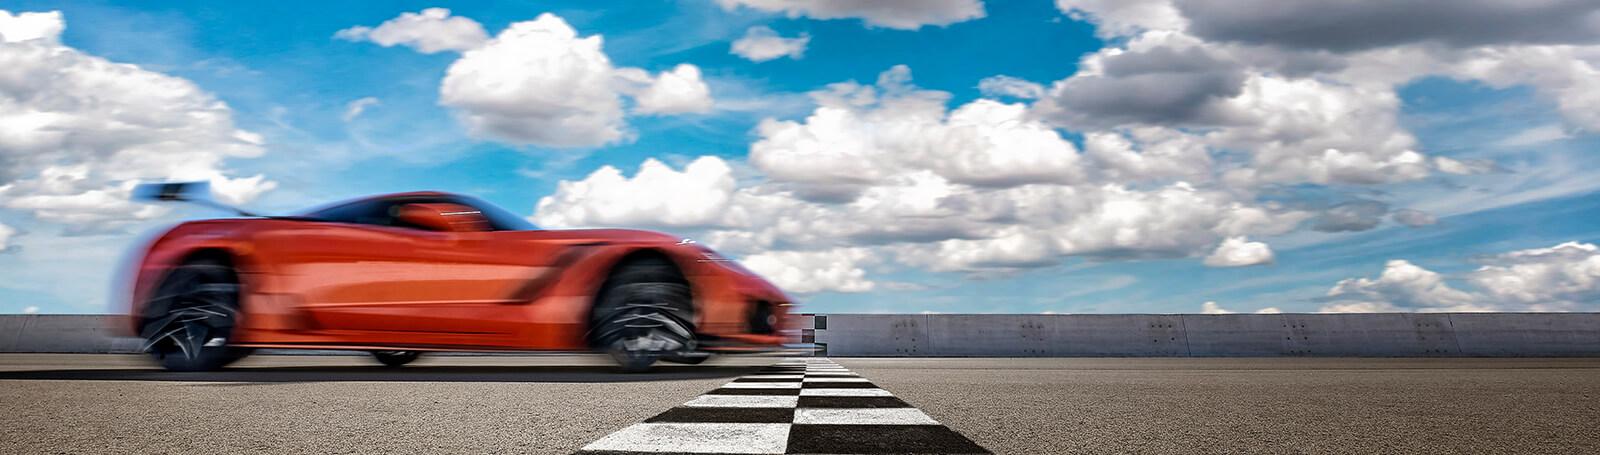 Garmin Motorsports